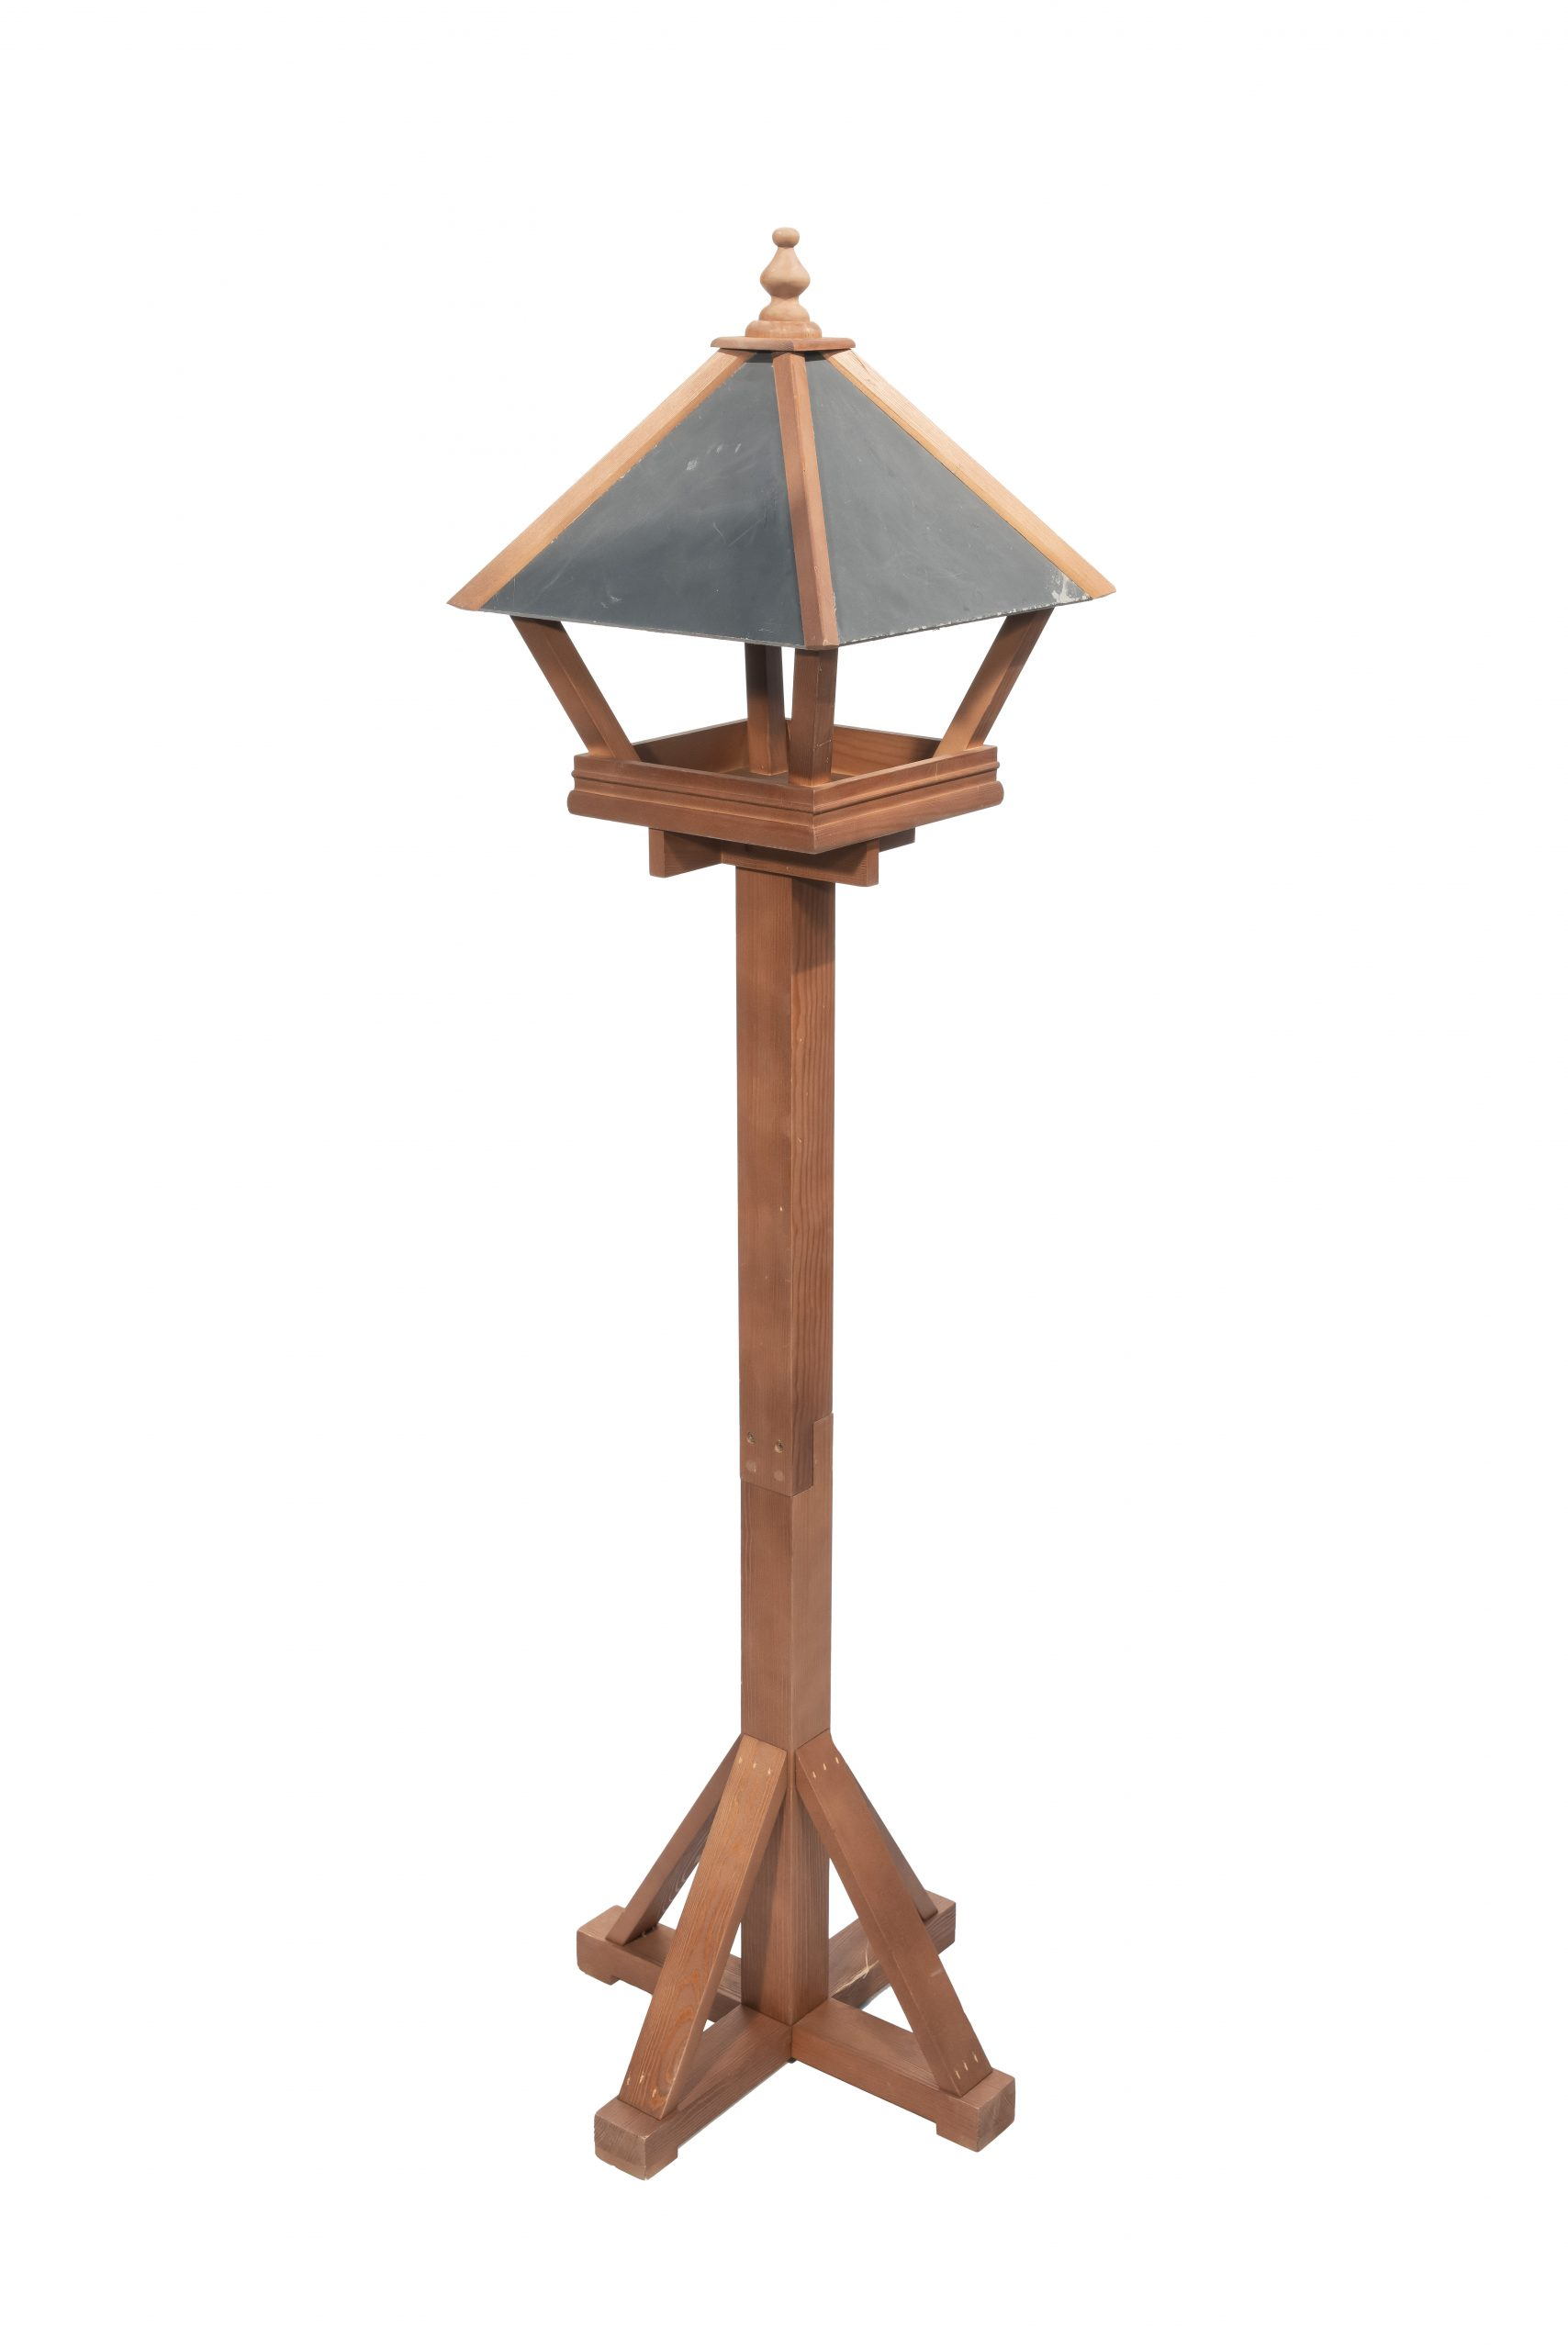 The Grantham Bird Table